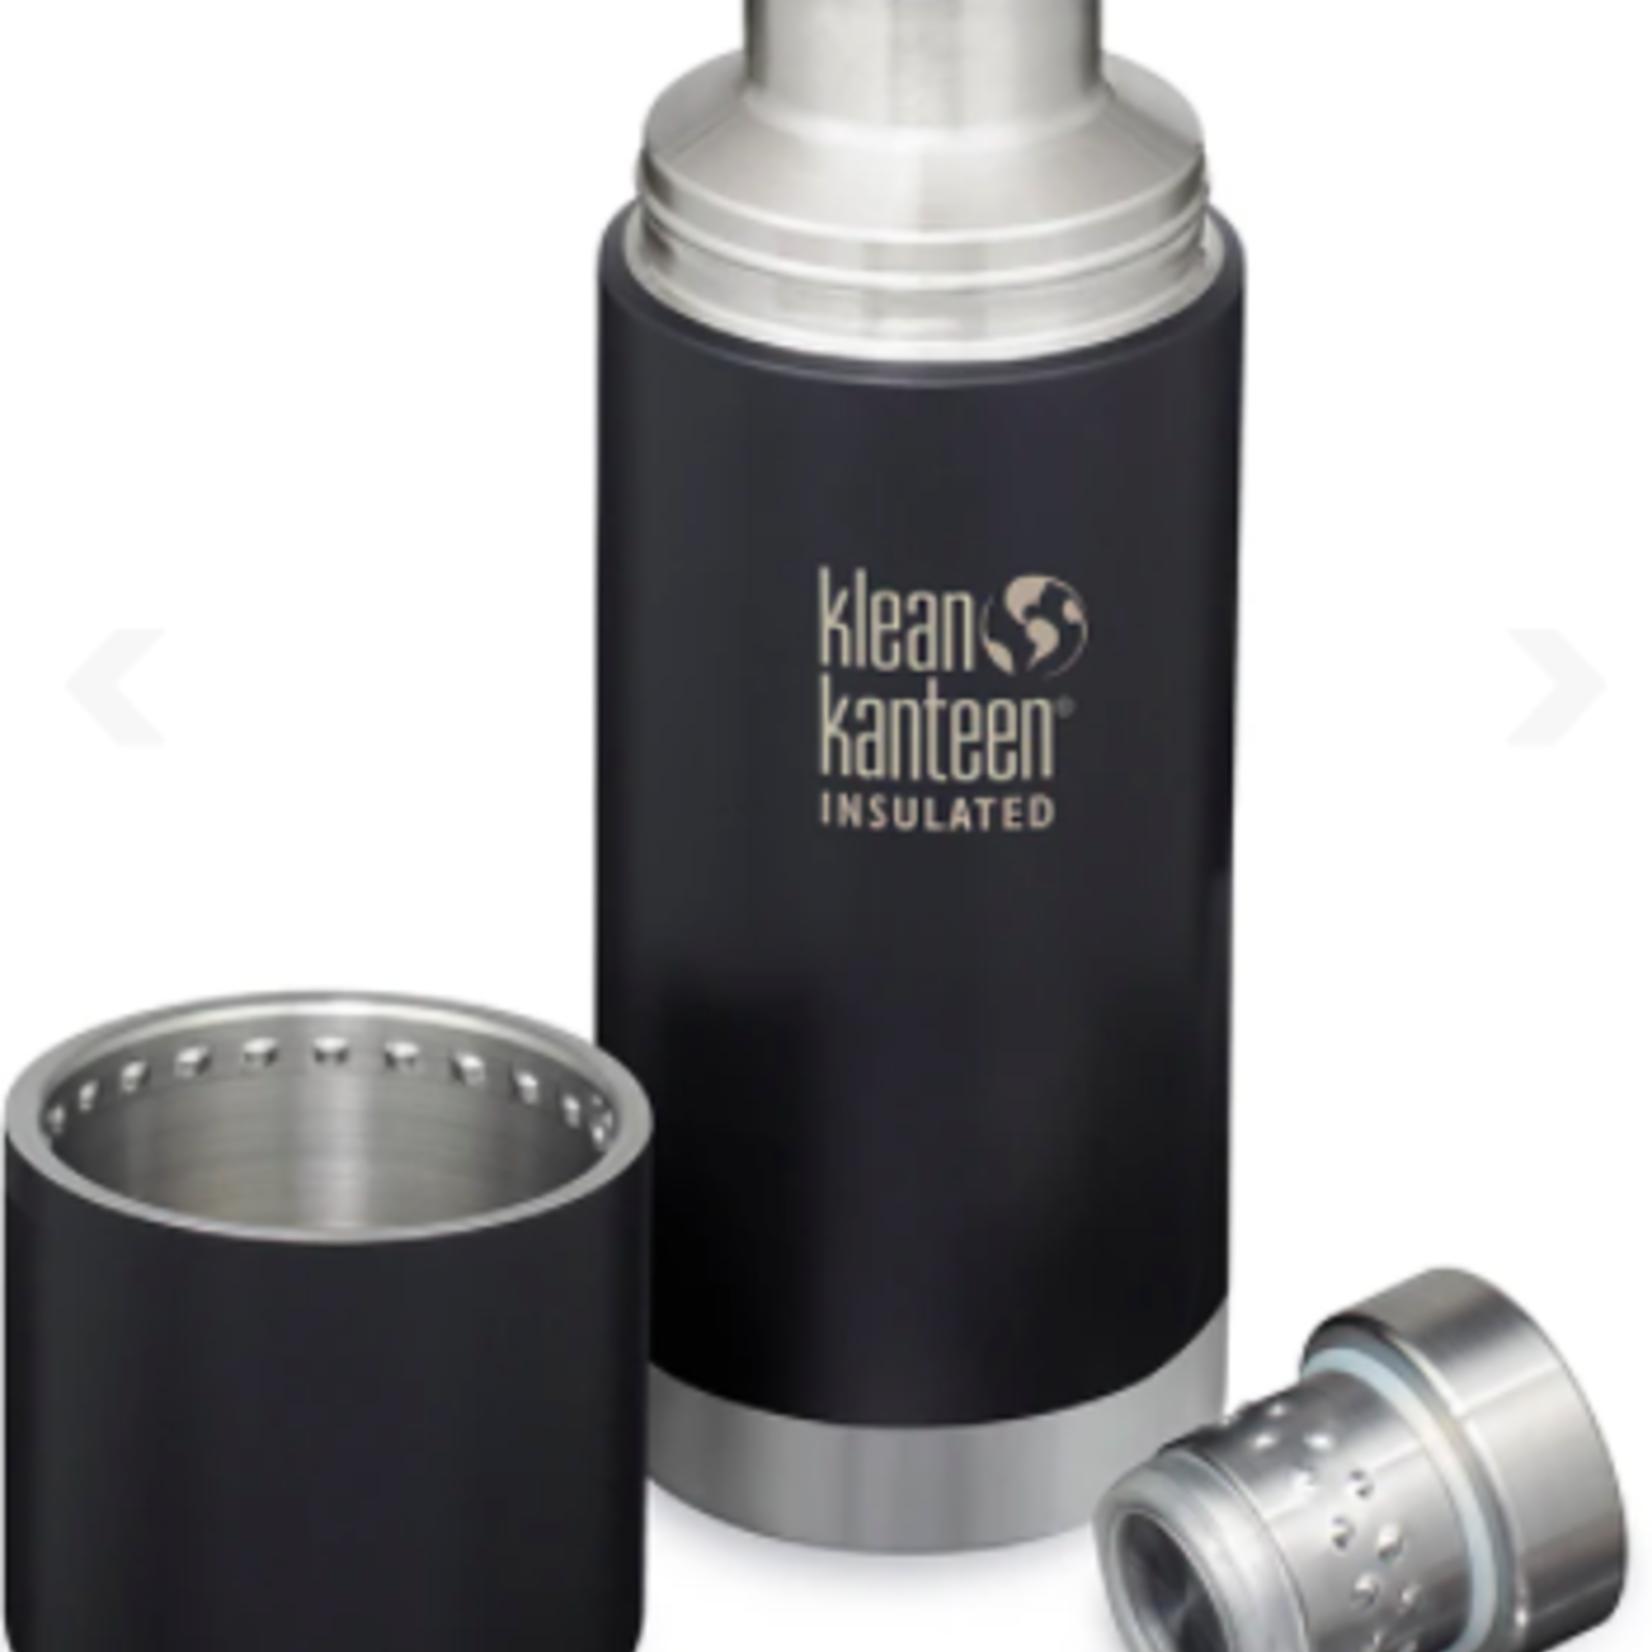 Klean Kanteen 25 oz. Insulated TKPro